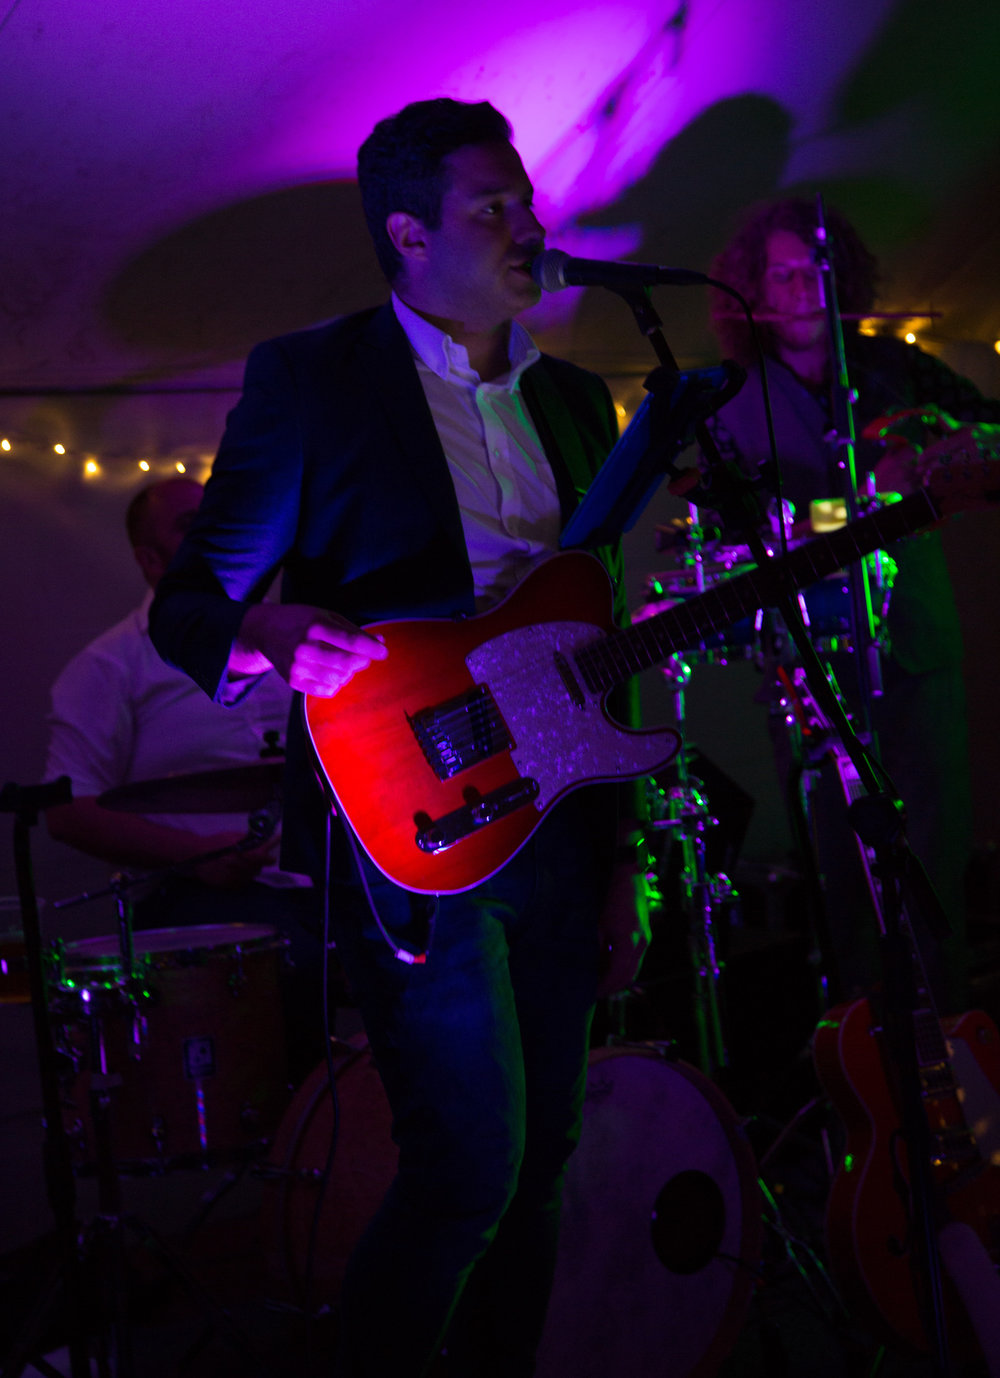 wedding-band-function-london-festival-music.jpg